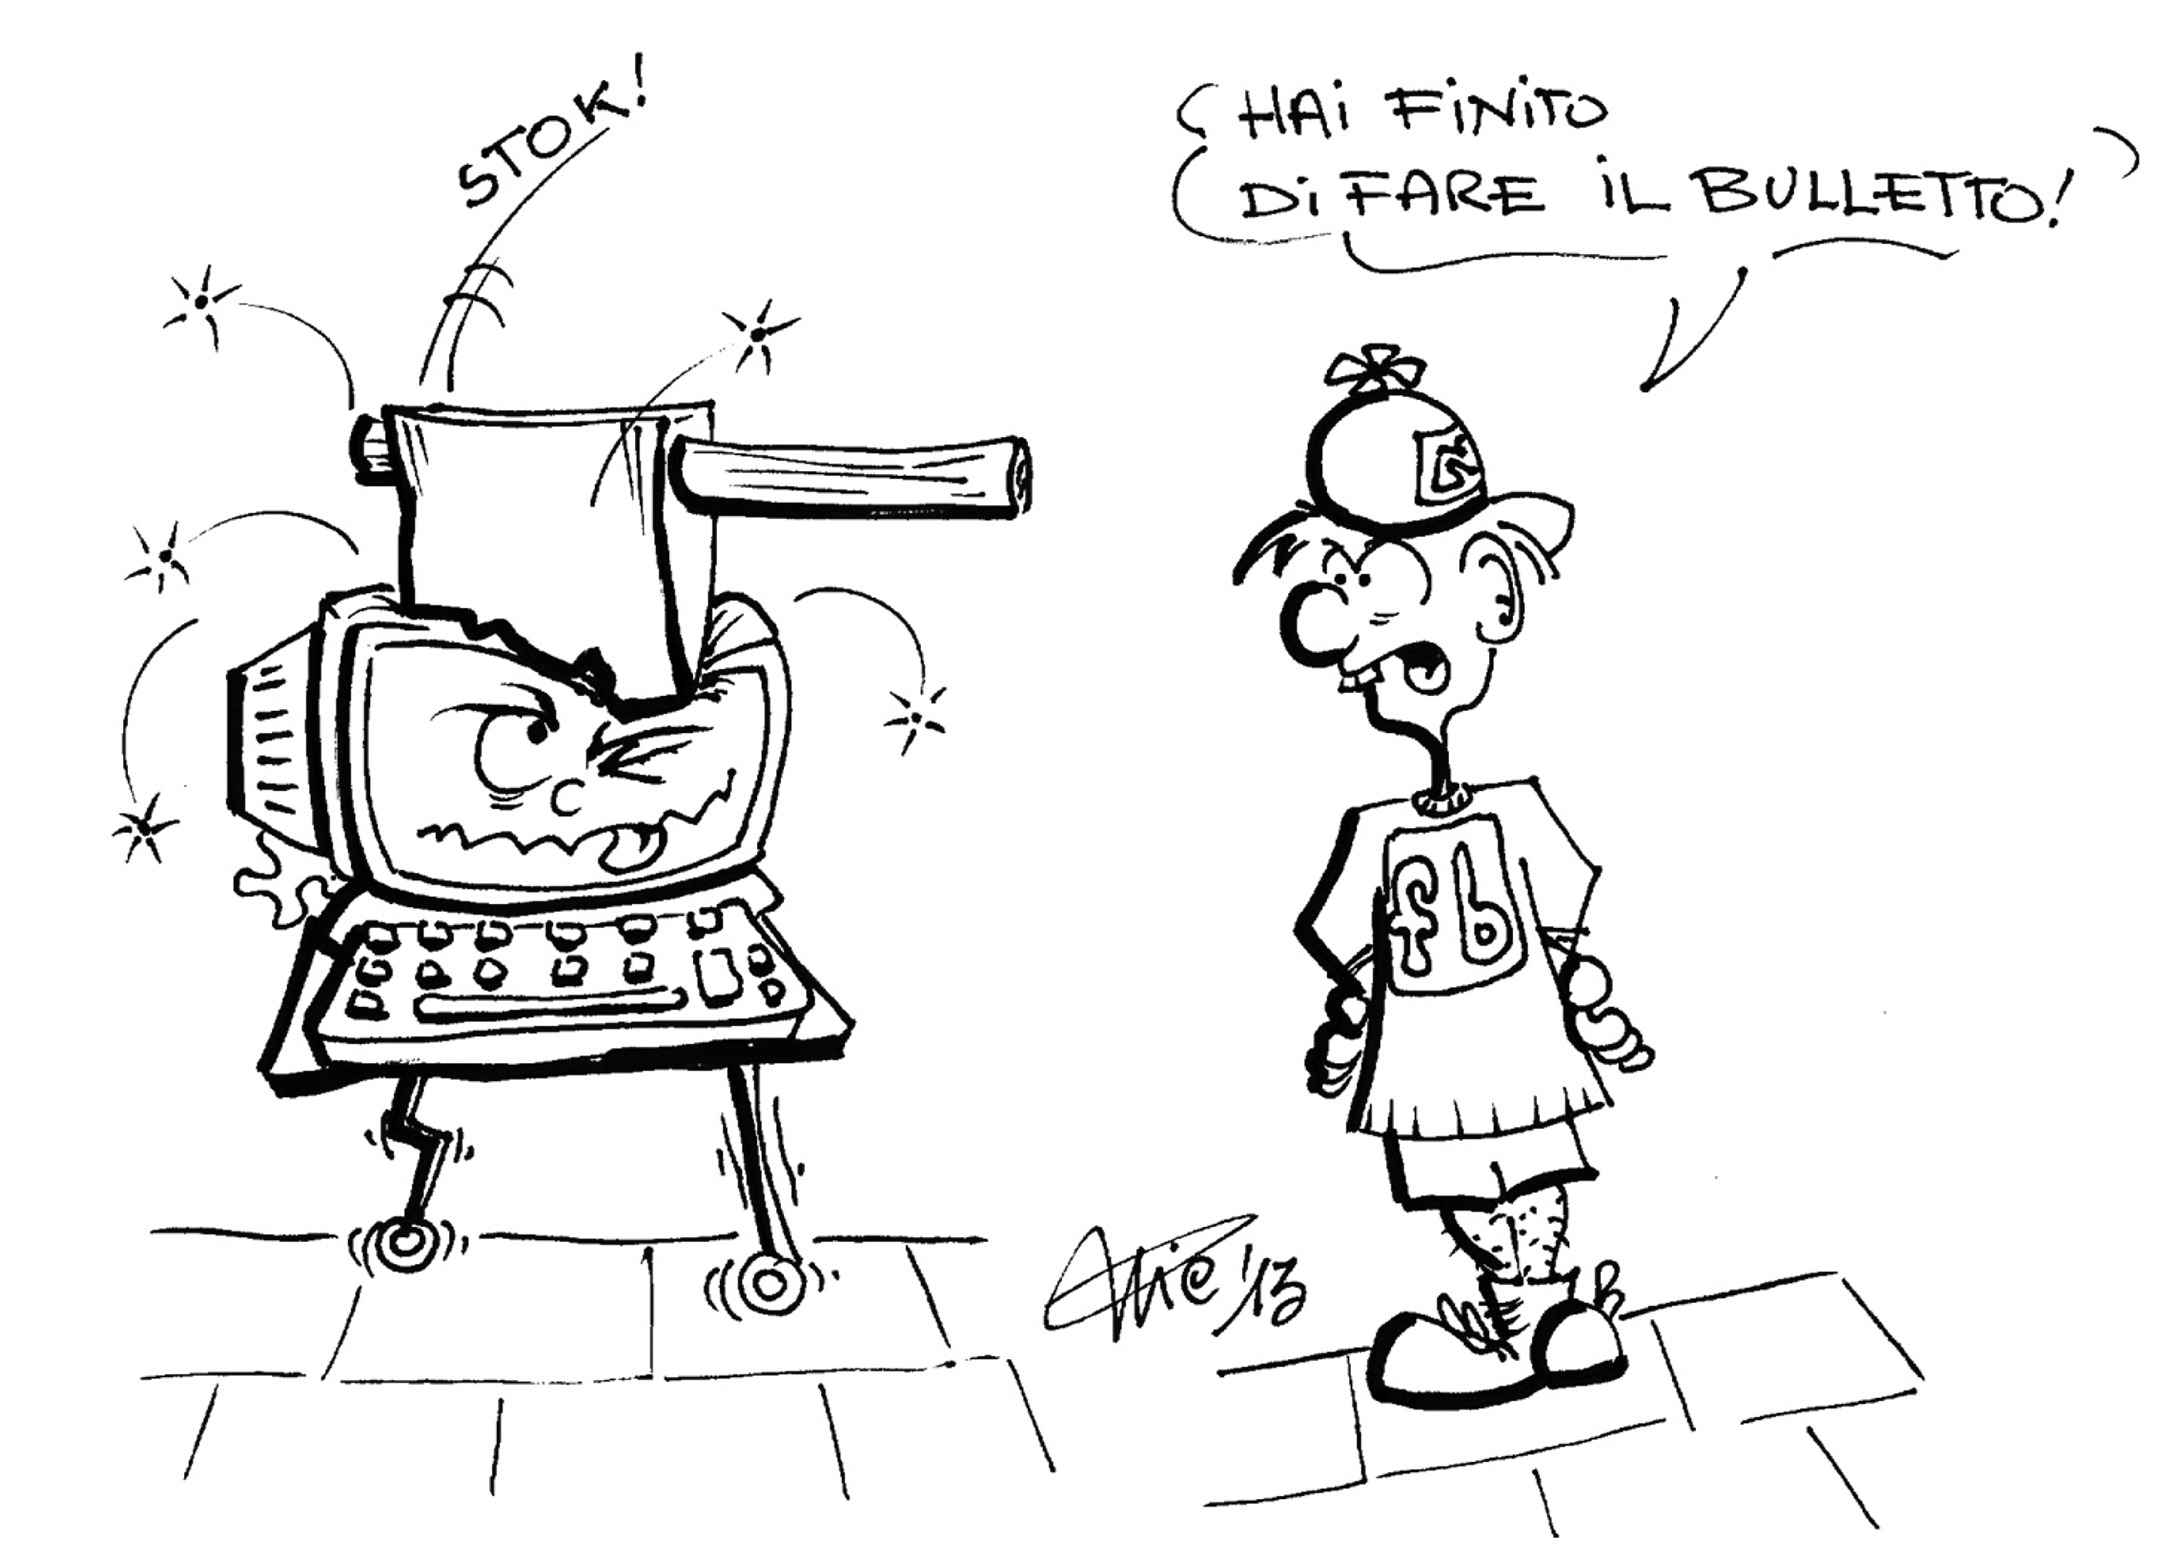 Cyberbullismo1